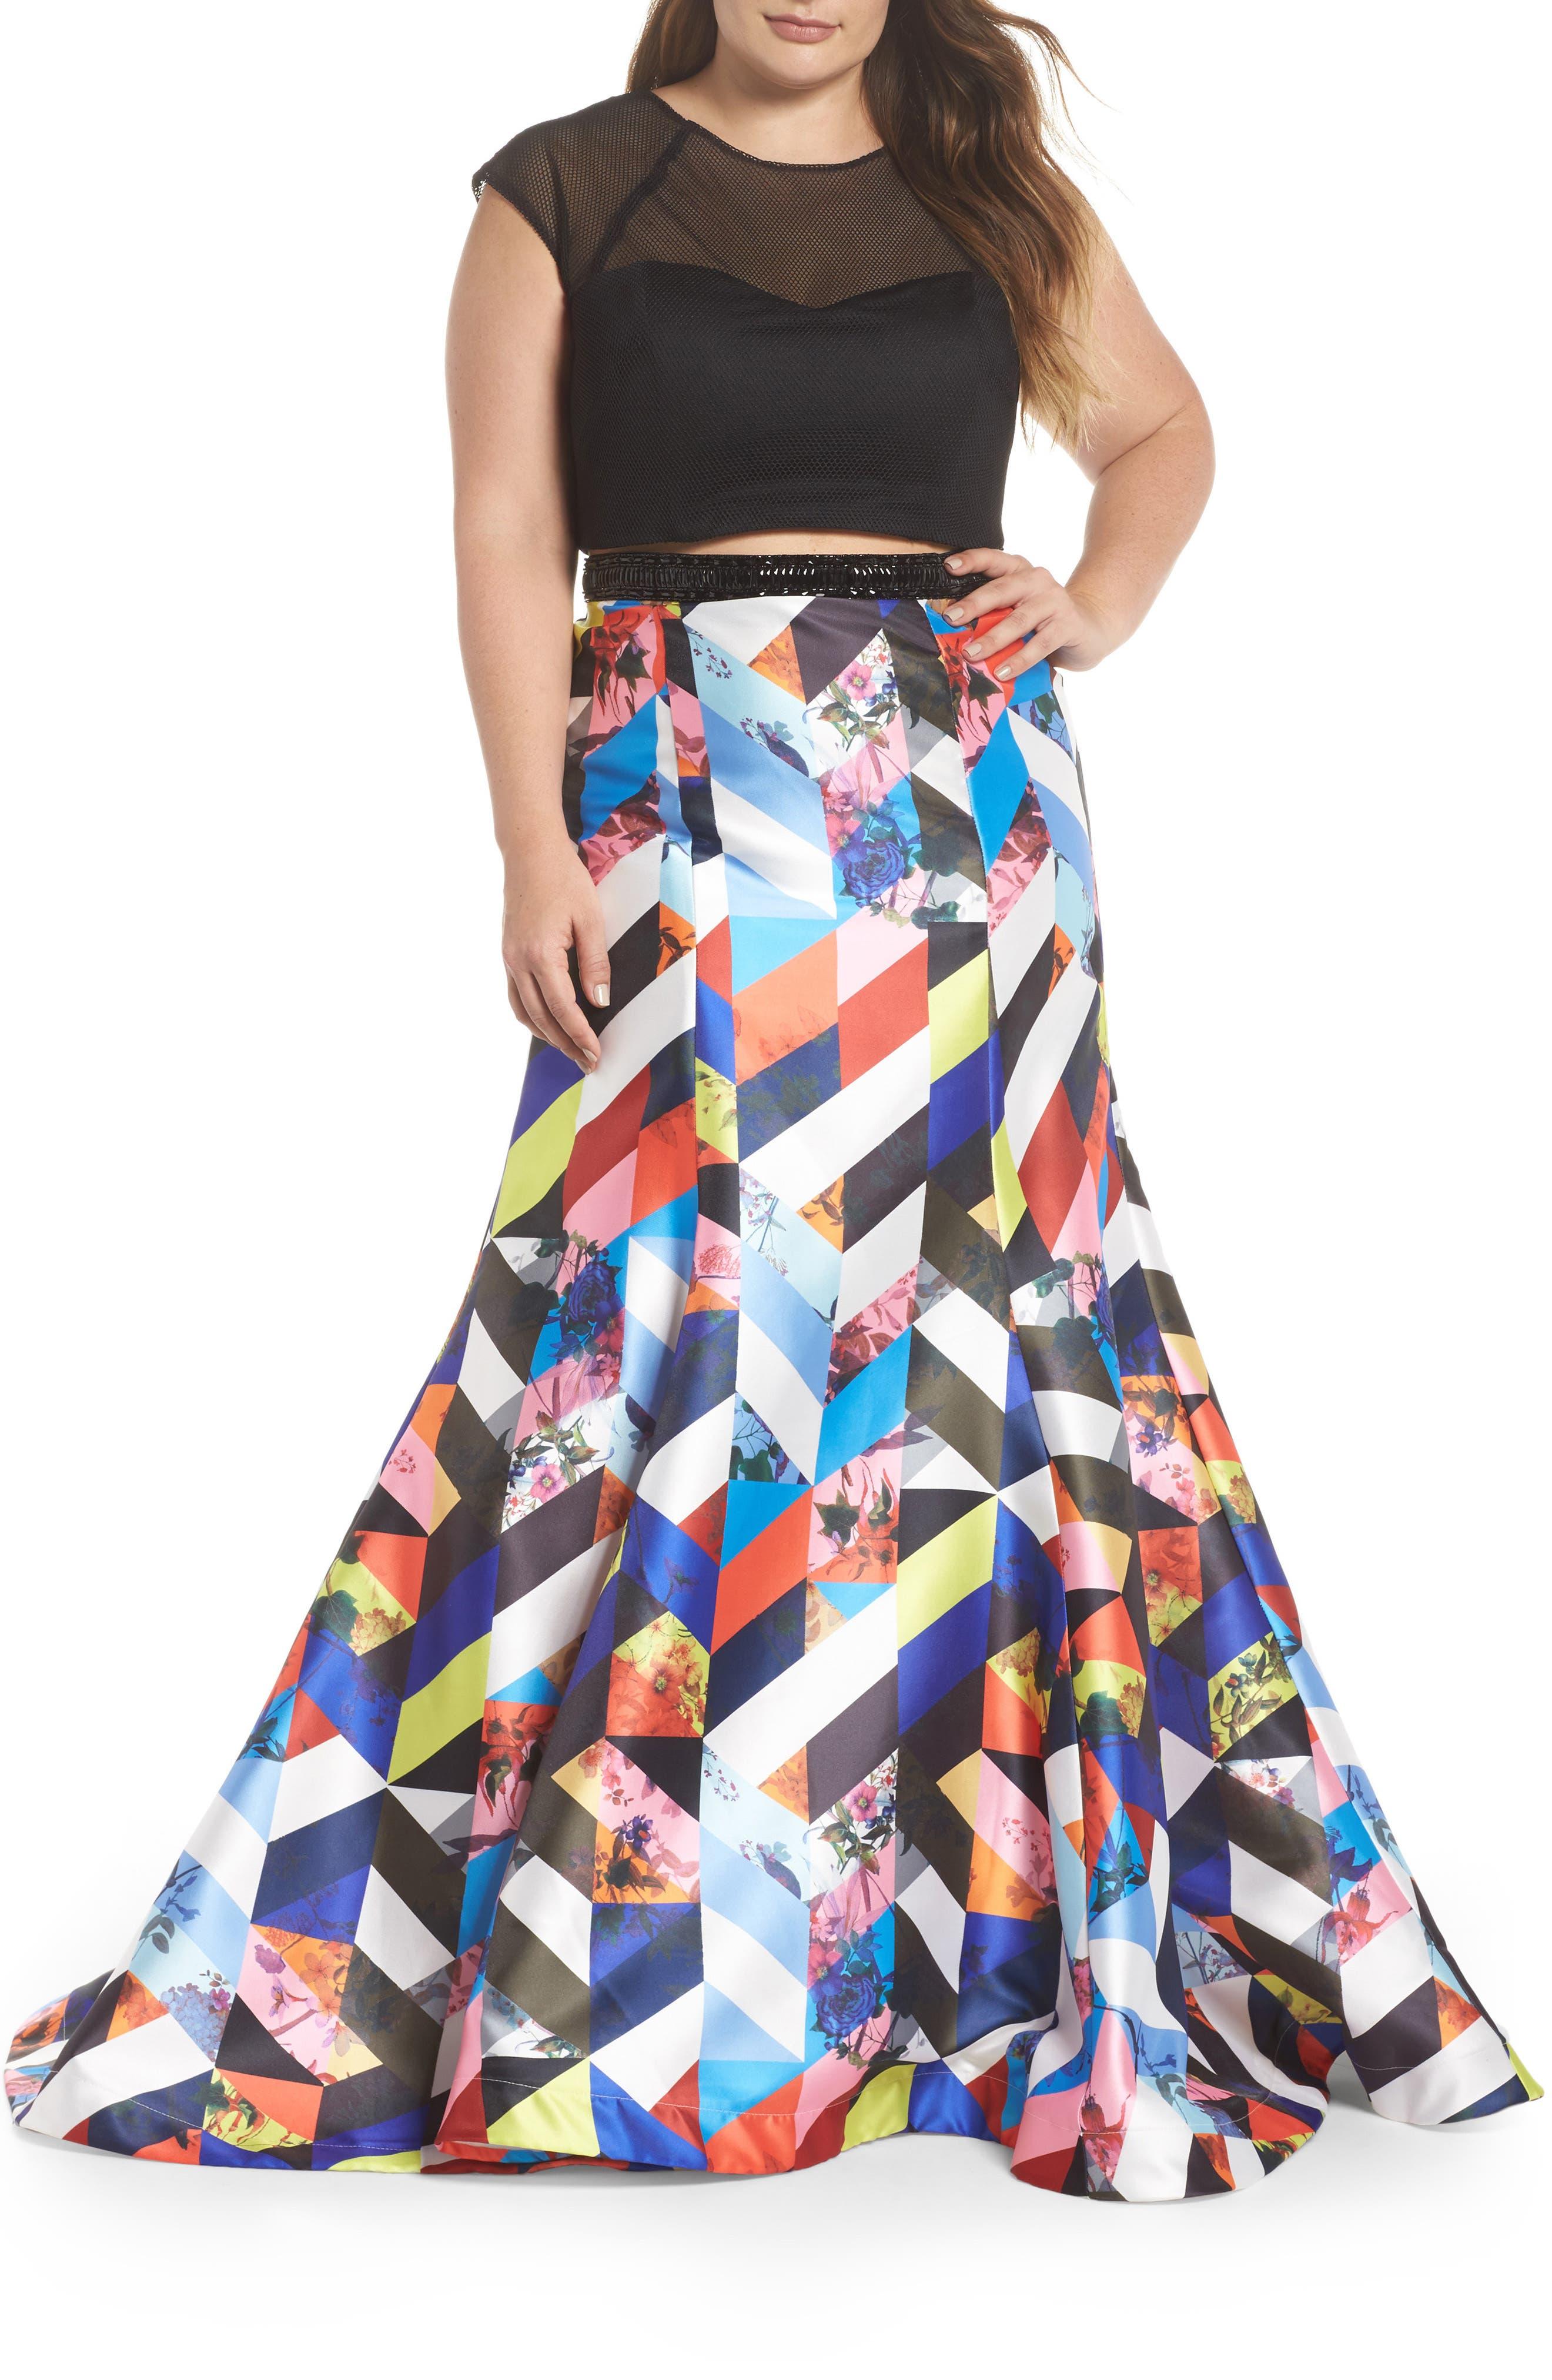 Mesh & Print Two-Piece Gown,                             Main thumbnail 1, color,                             BLACK/ MULTI